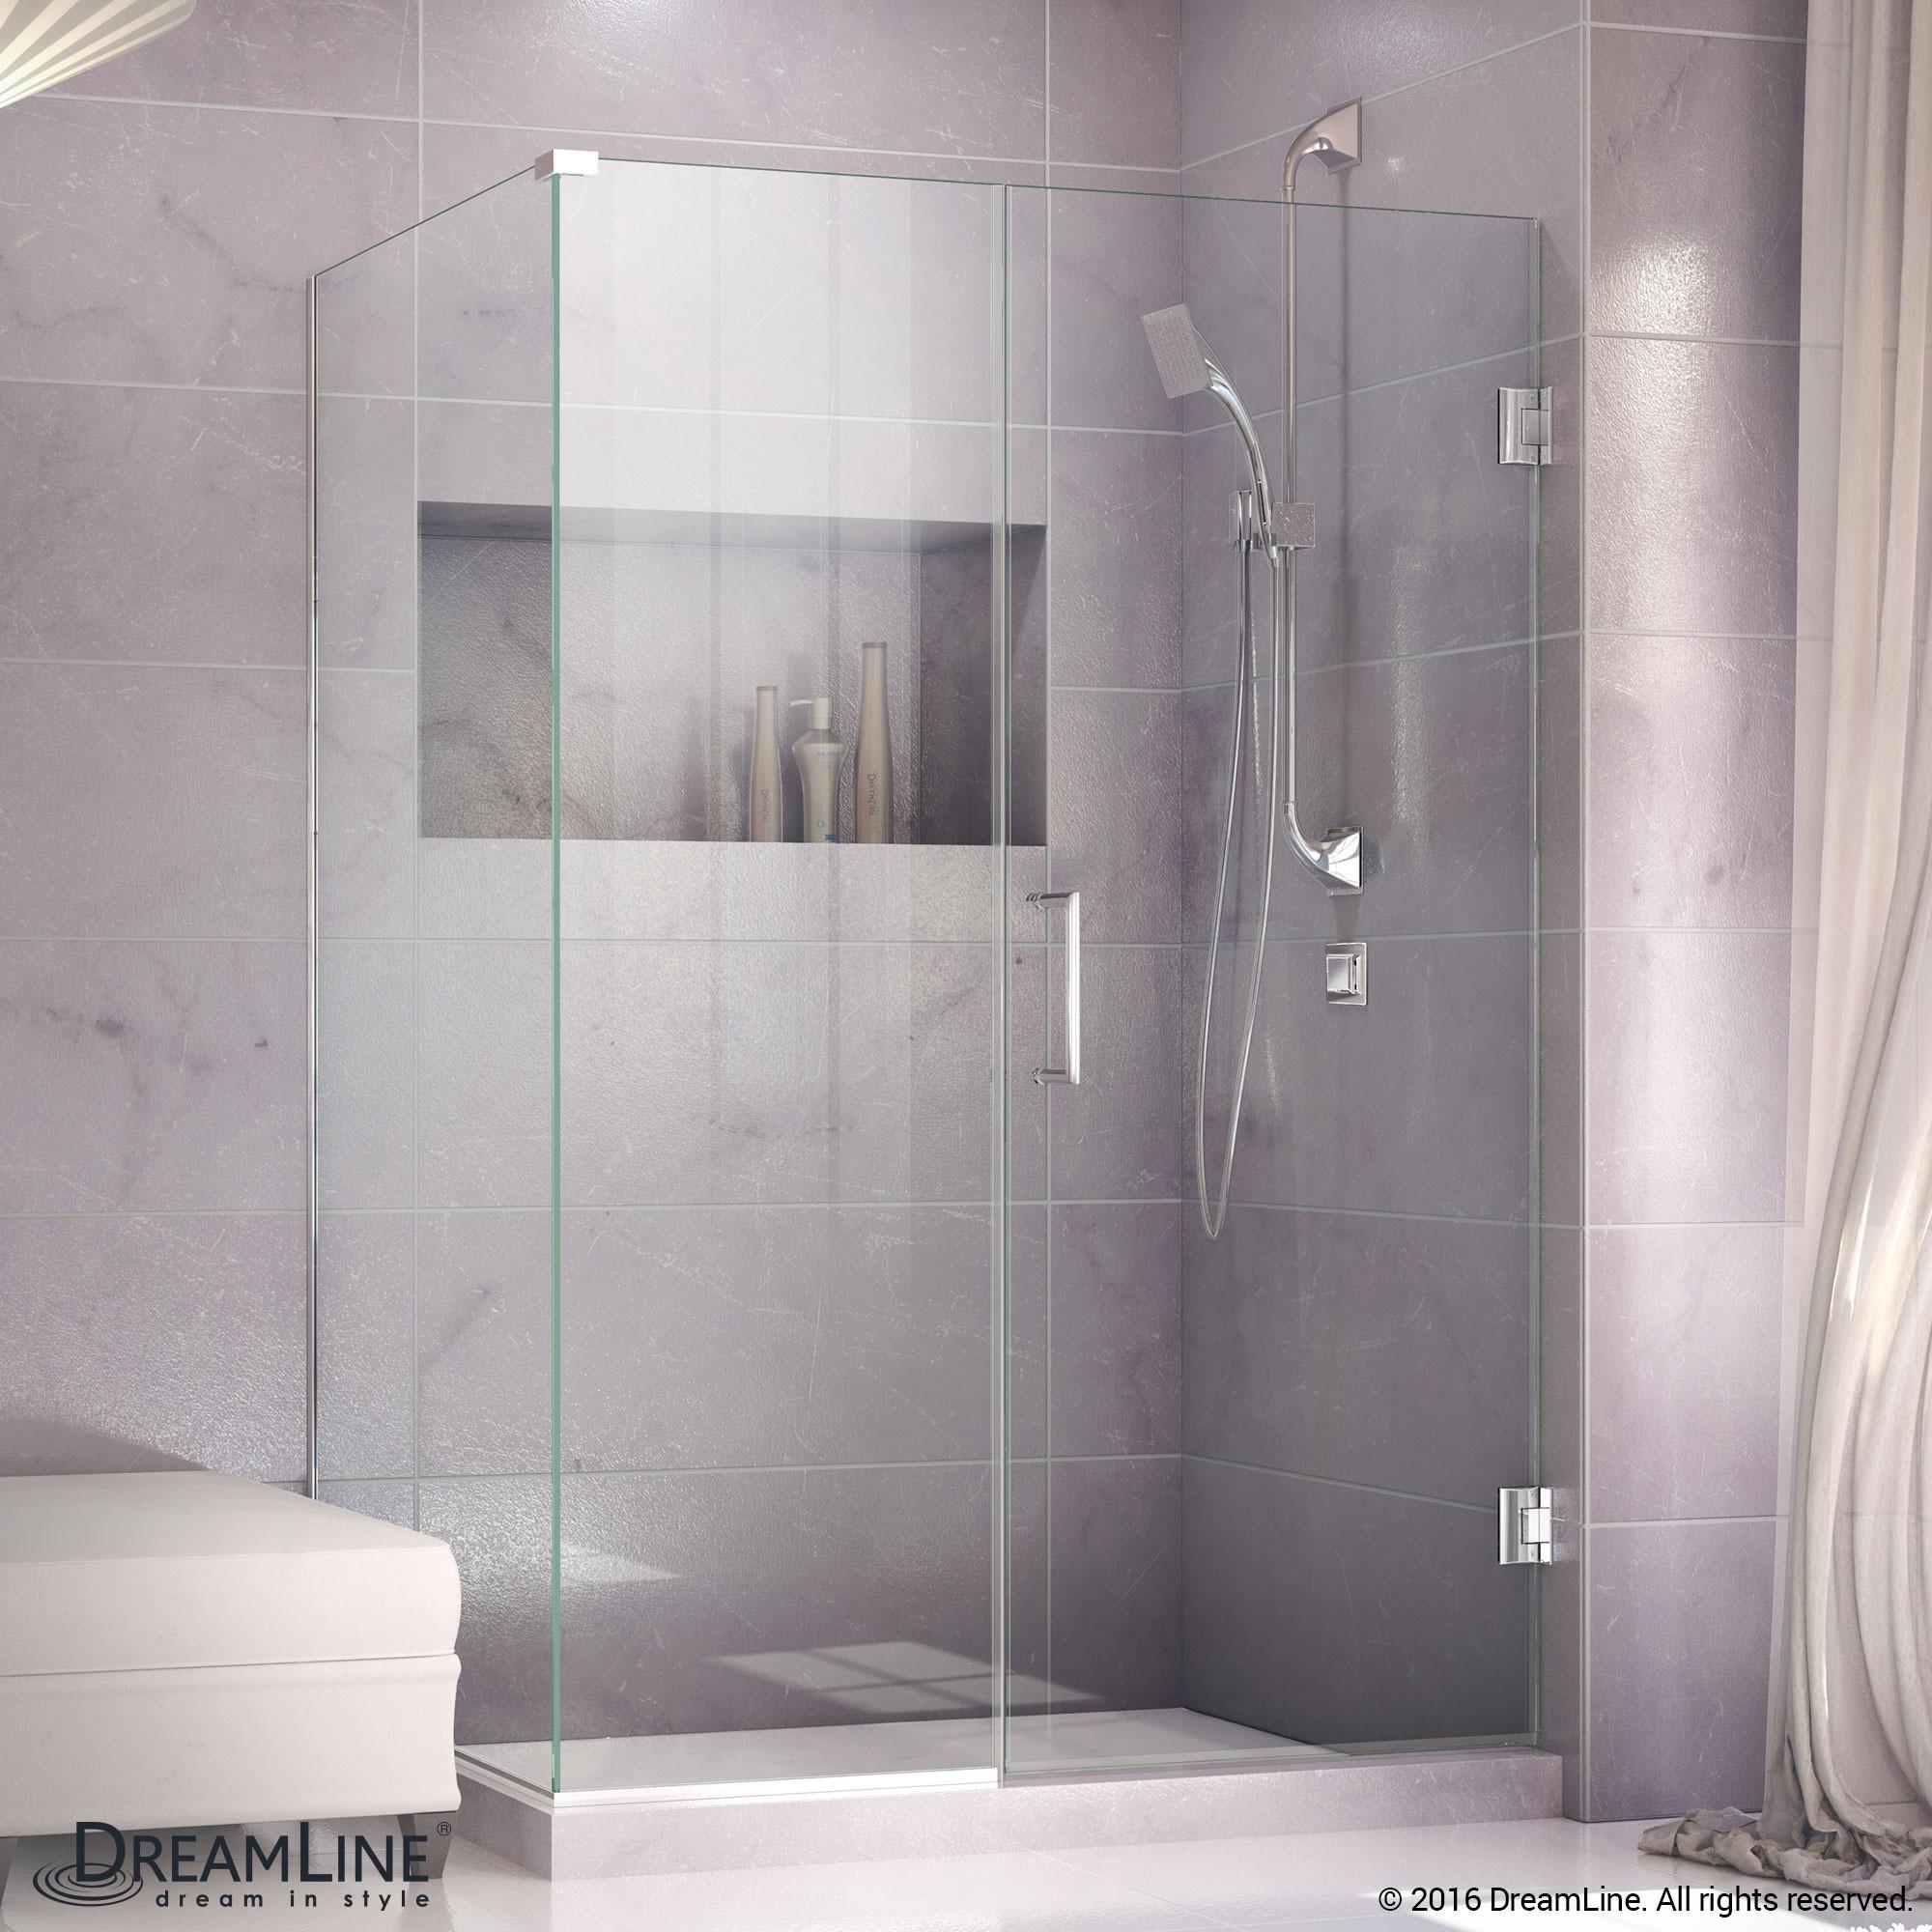 DreamLine SHEN-24540300-01 Unidoor Plus Hinged Shower Enclosure In Chrome Finish Hardware